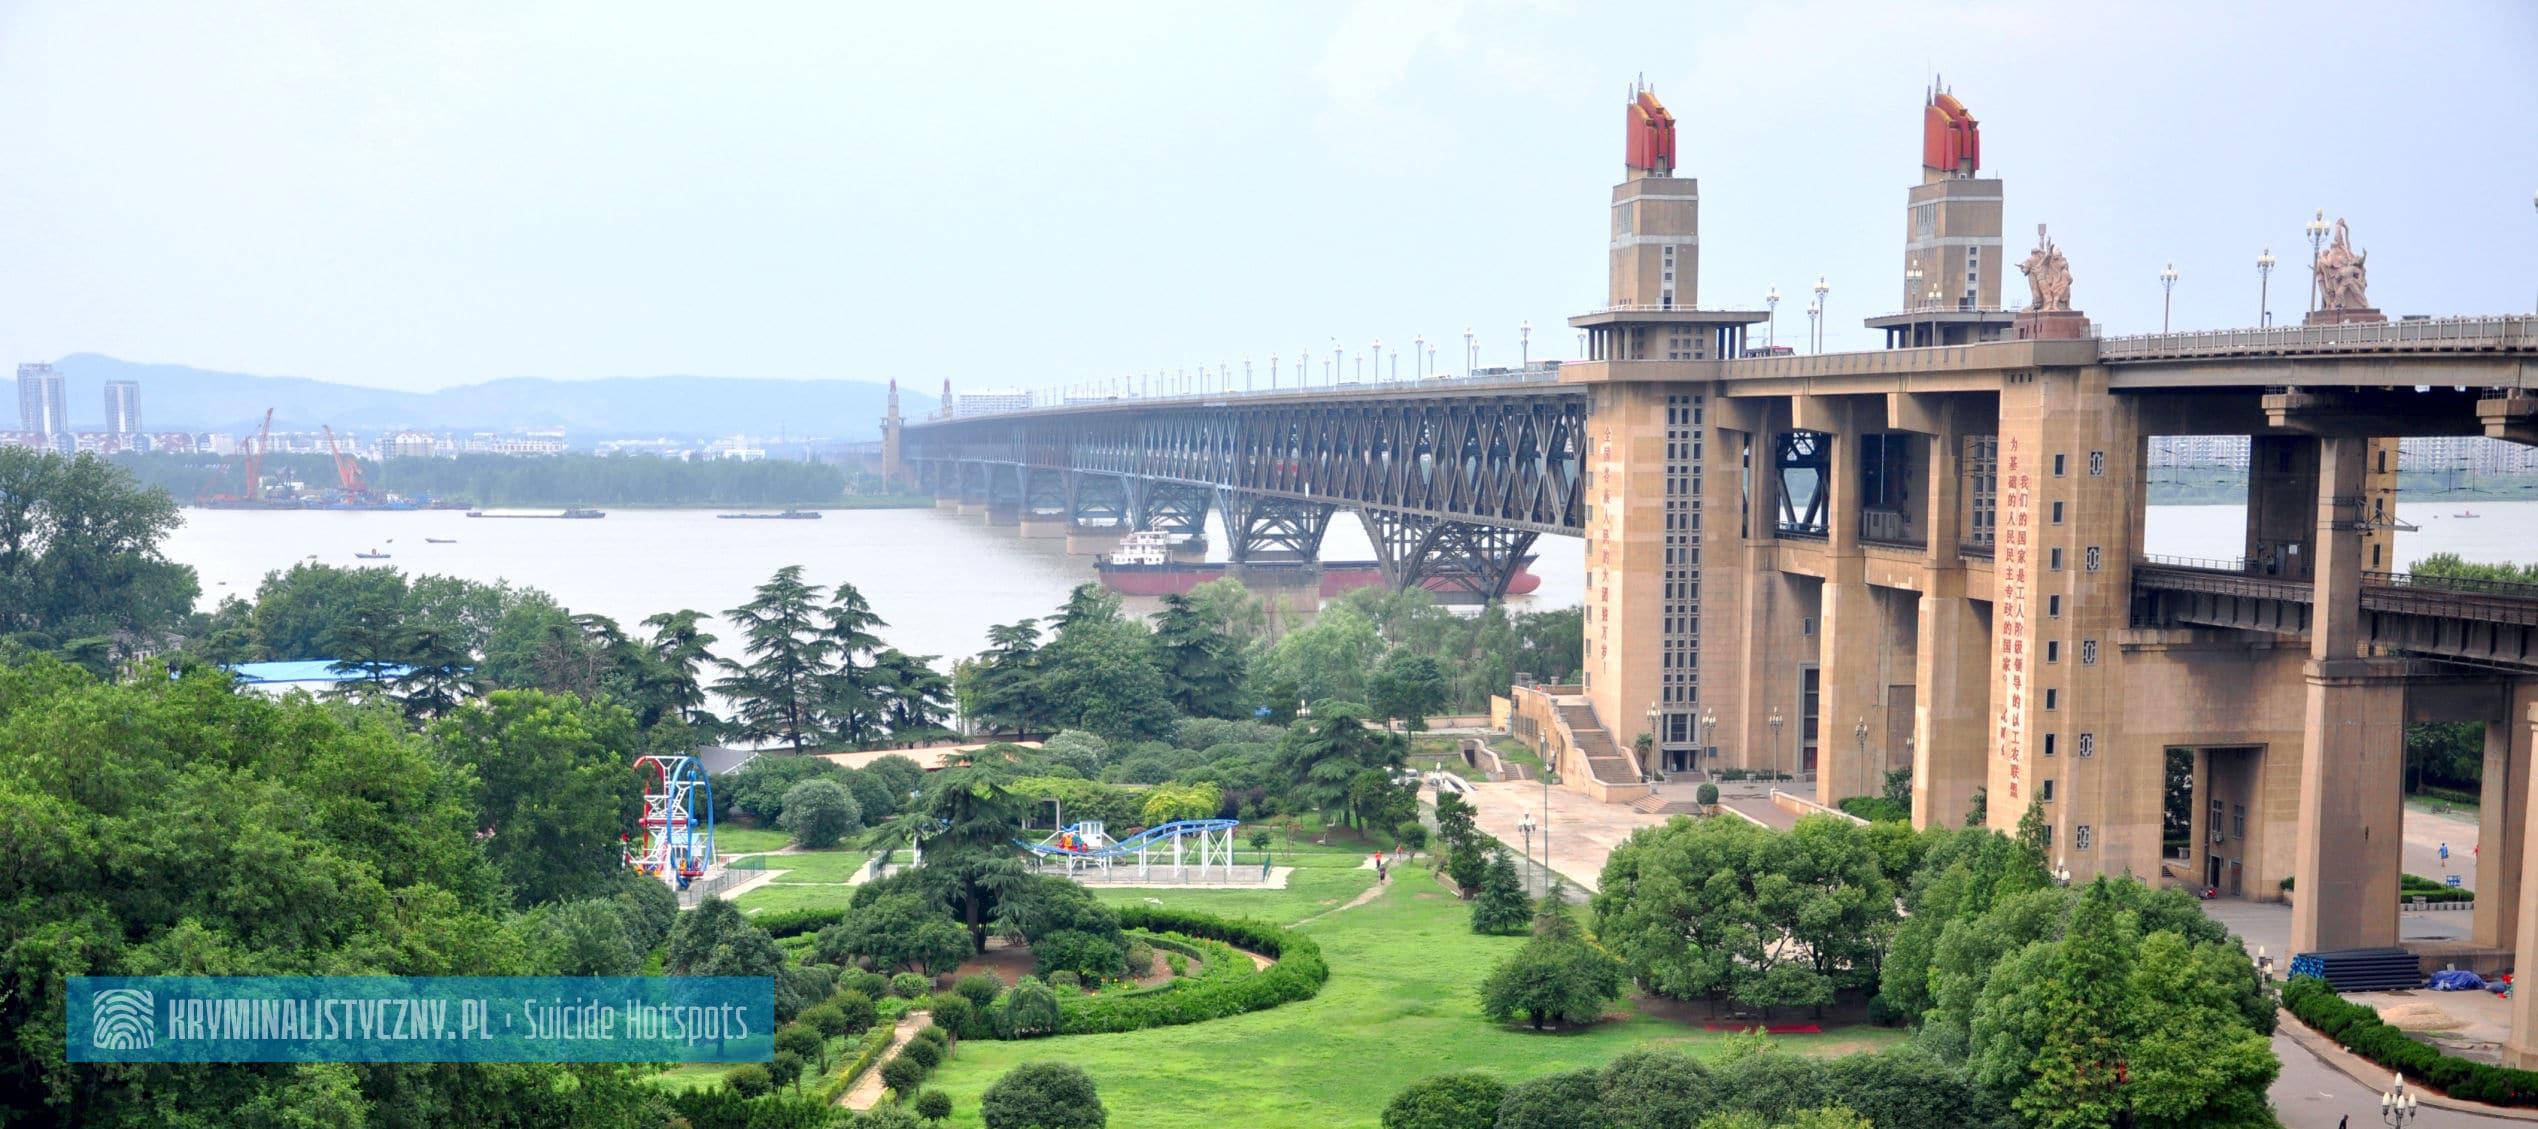 Suicide Hotspots Nanjing Yangtze